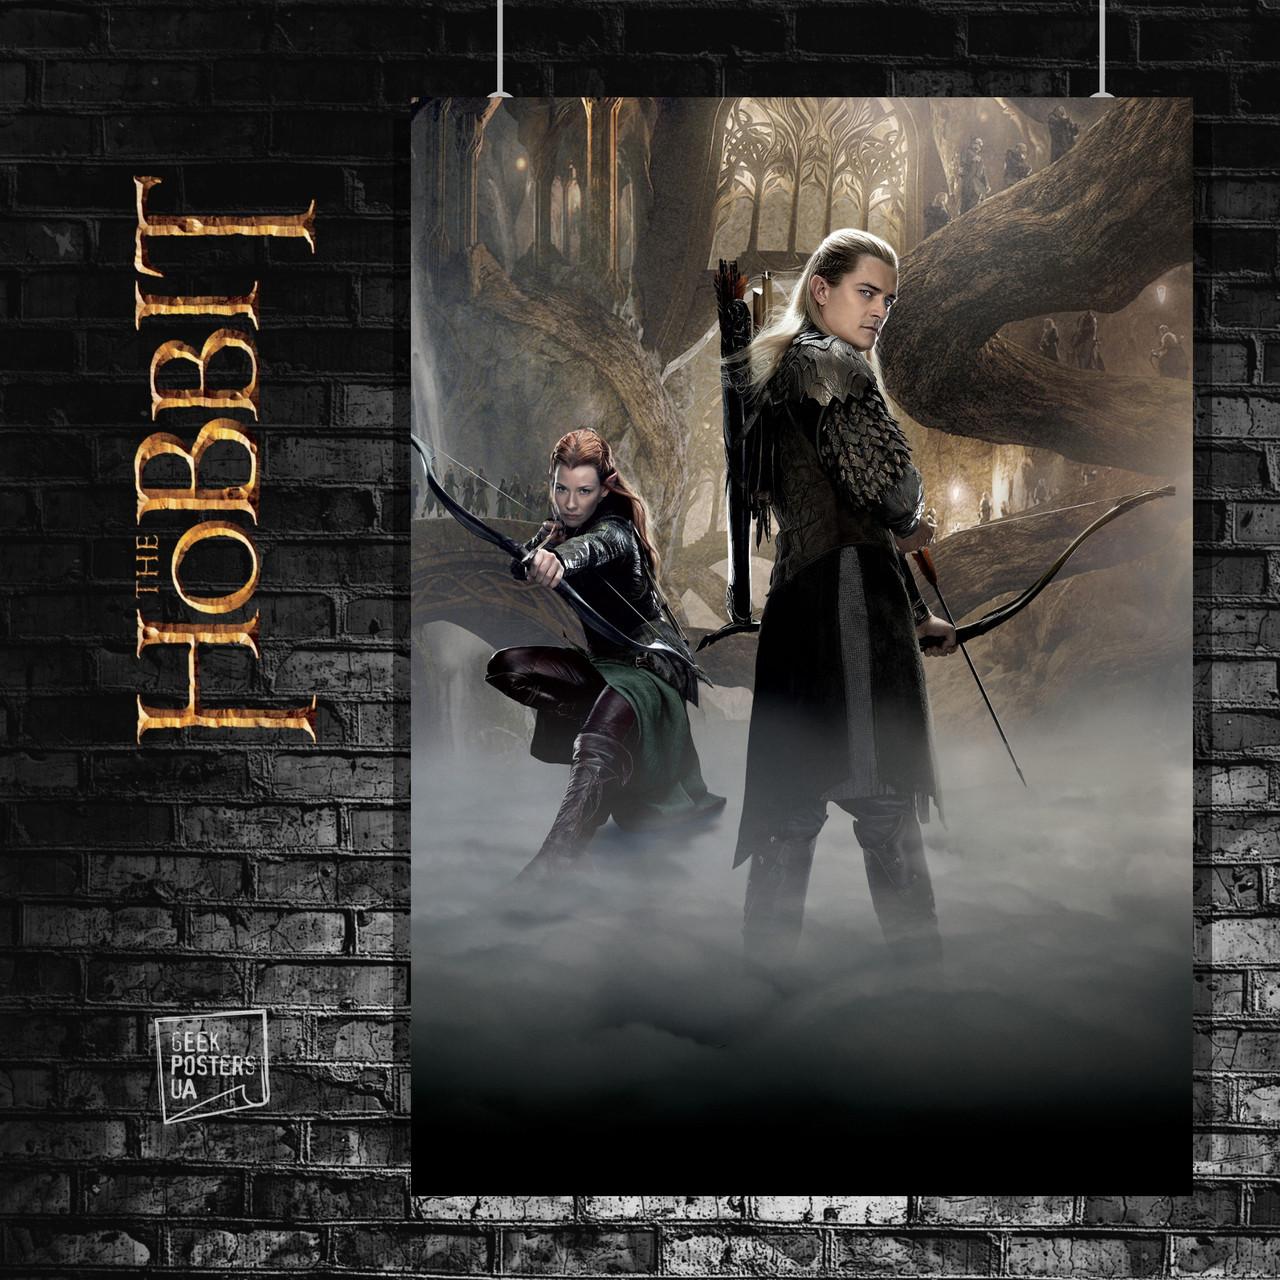 Постер Леголас и эльфийка Тауриэль. Властелин Колец, Lord Of The Rings, Хоббит, Hobbit. Размер 60x43см (A2). Глянцевая бумага